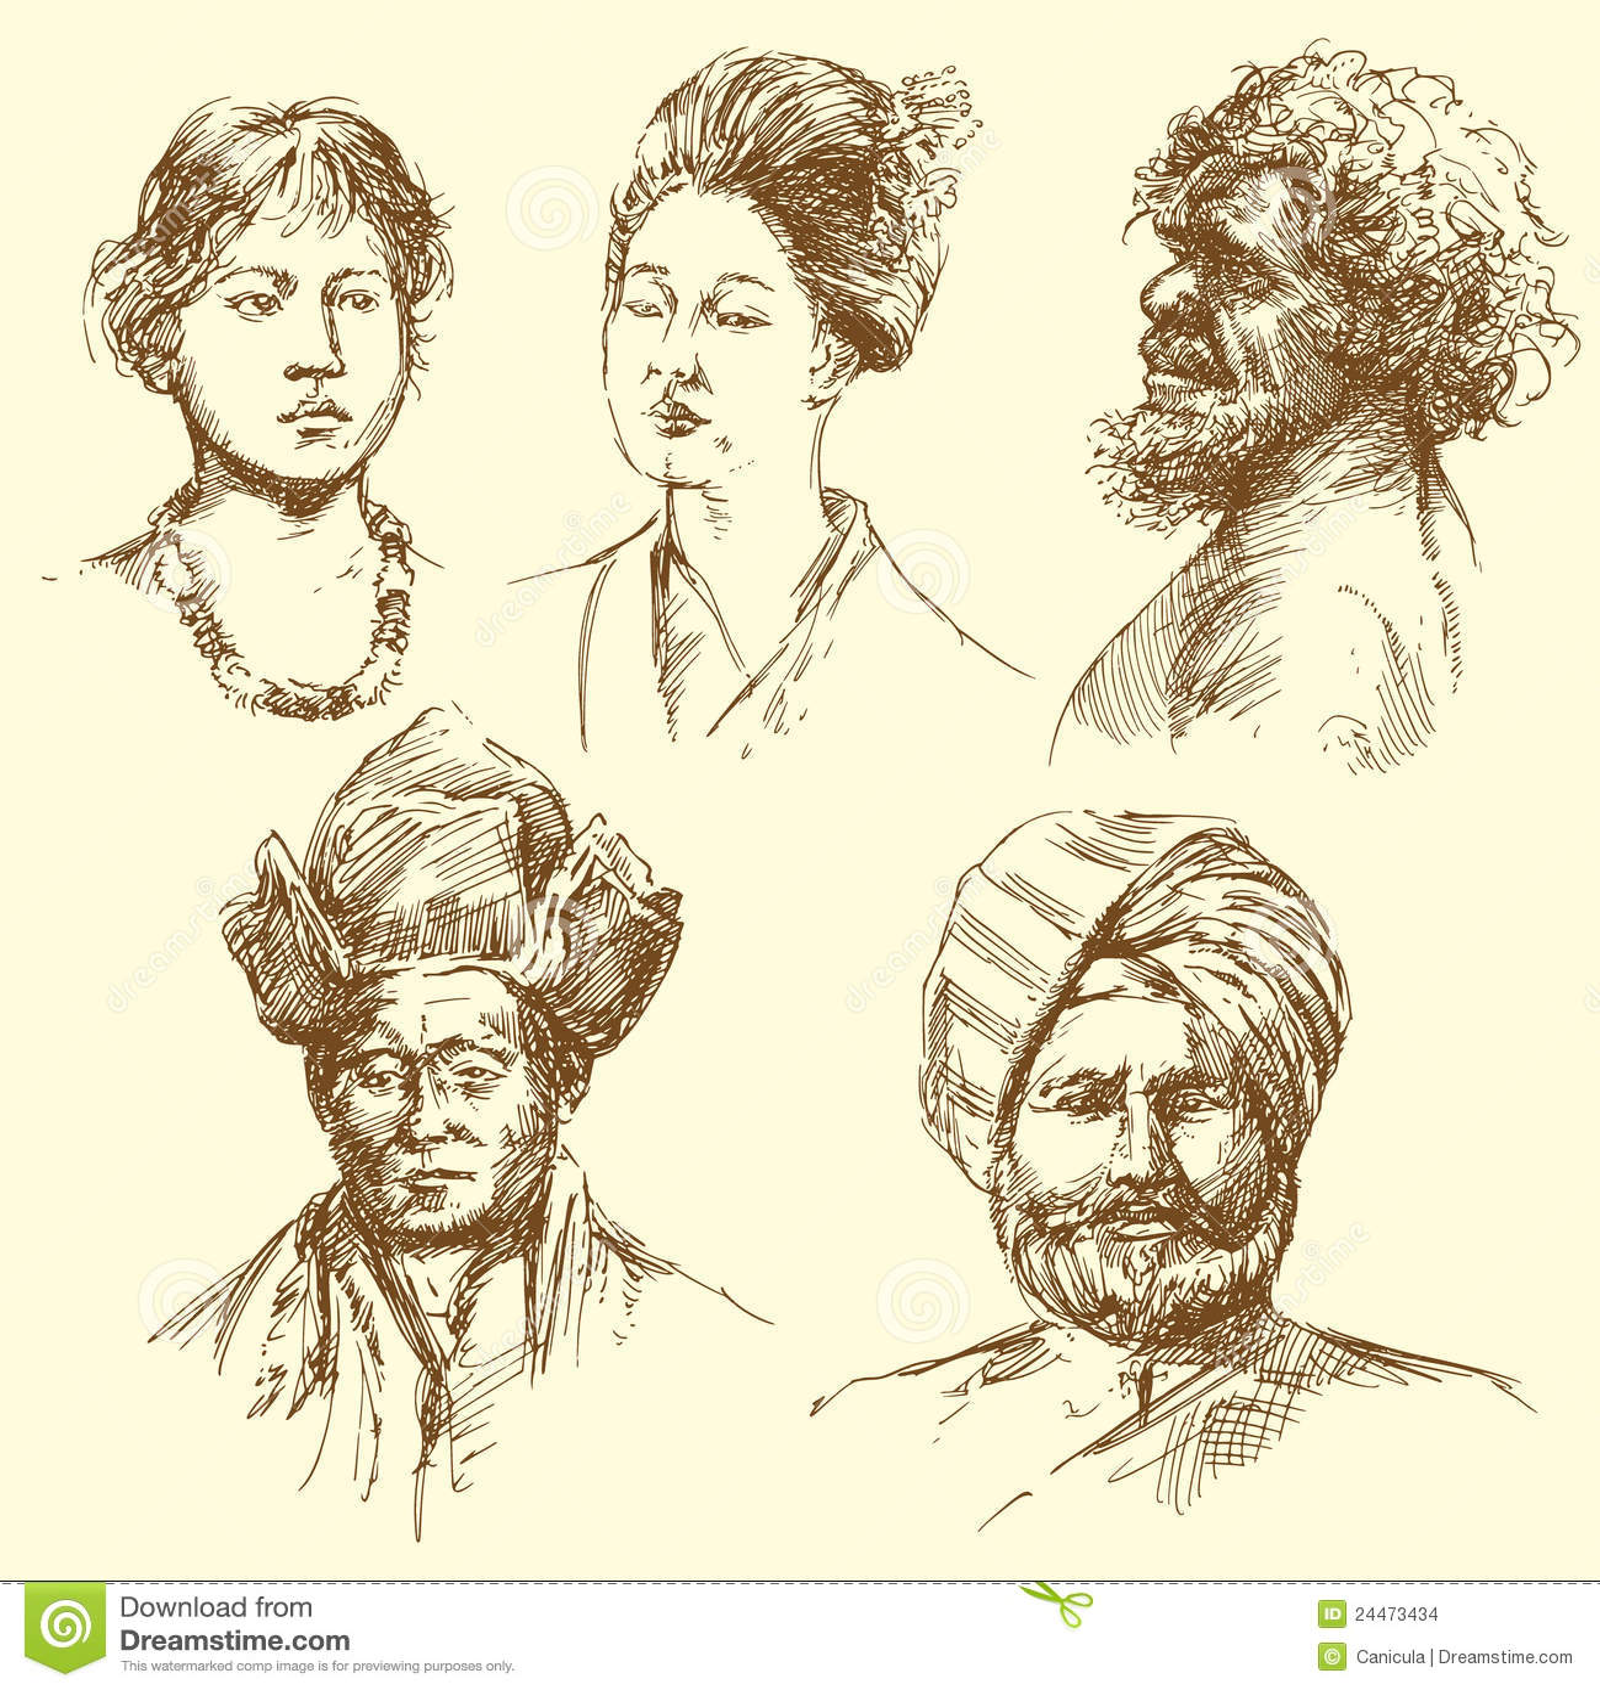 Diversidade humana - retratos